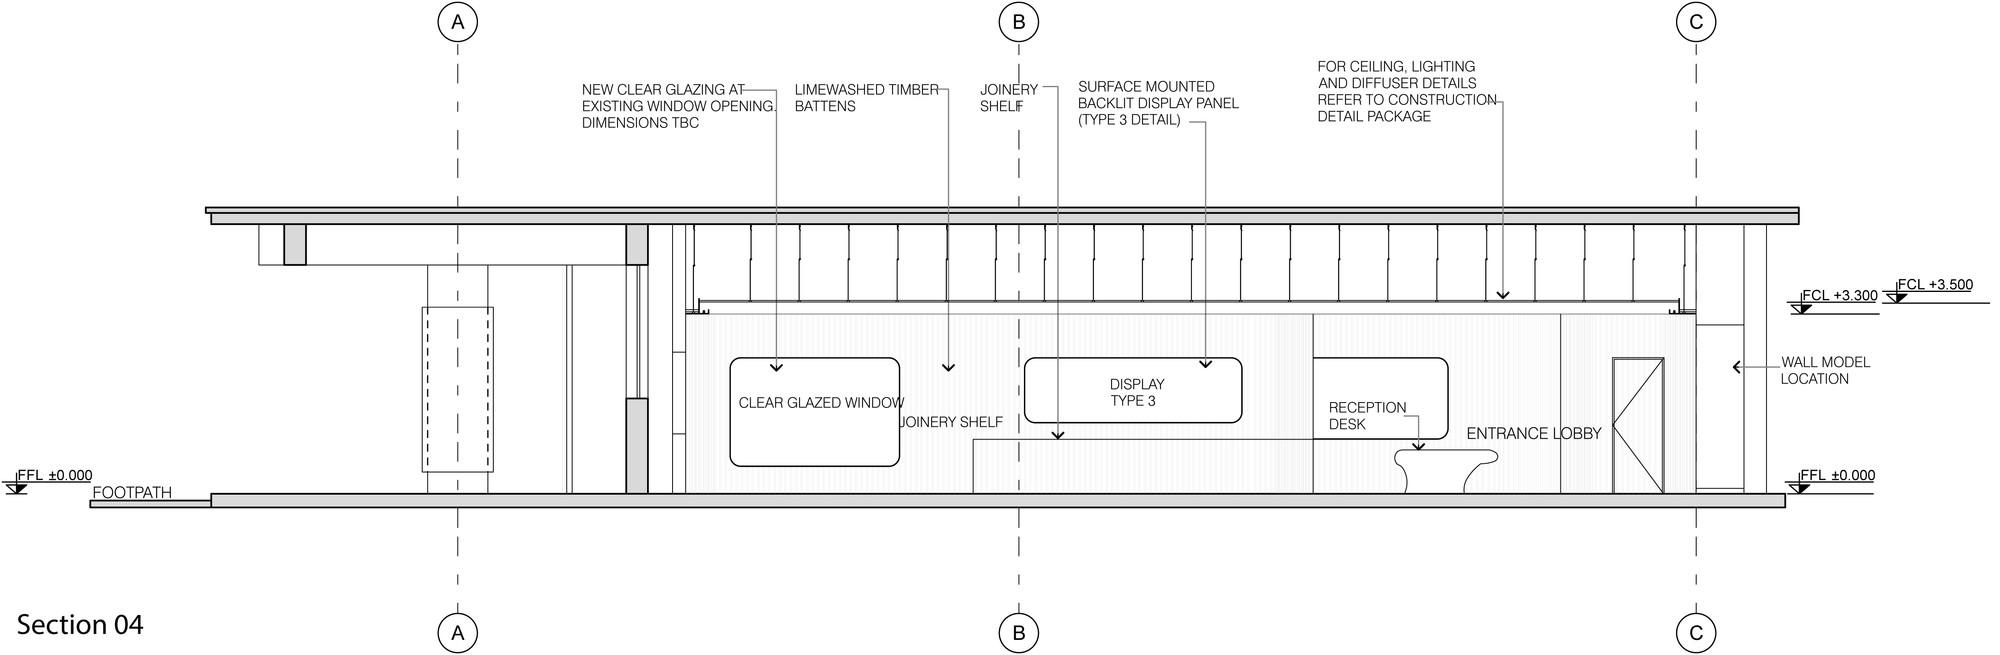 medium resolution of gallery of sydney greenland centre marketing suite ptw lava 16 skoda work manuals u003e fabia skoda felicia ignition switch wiring diagram